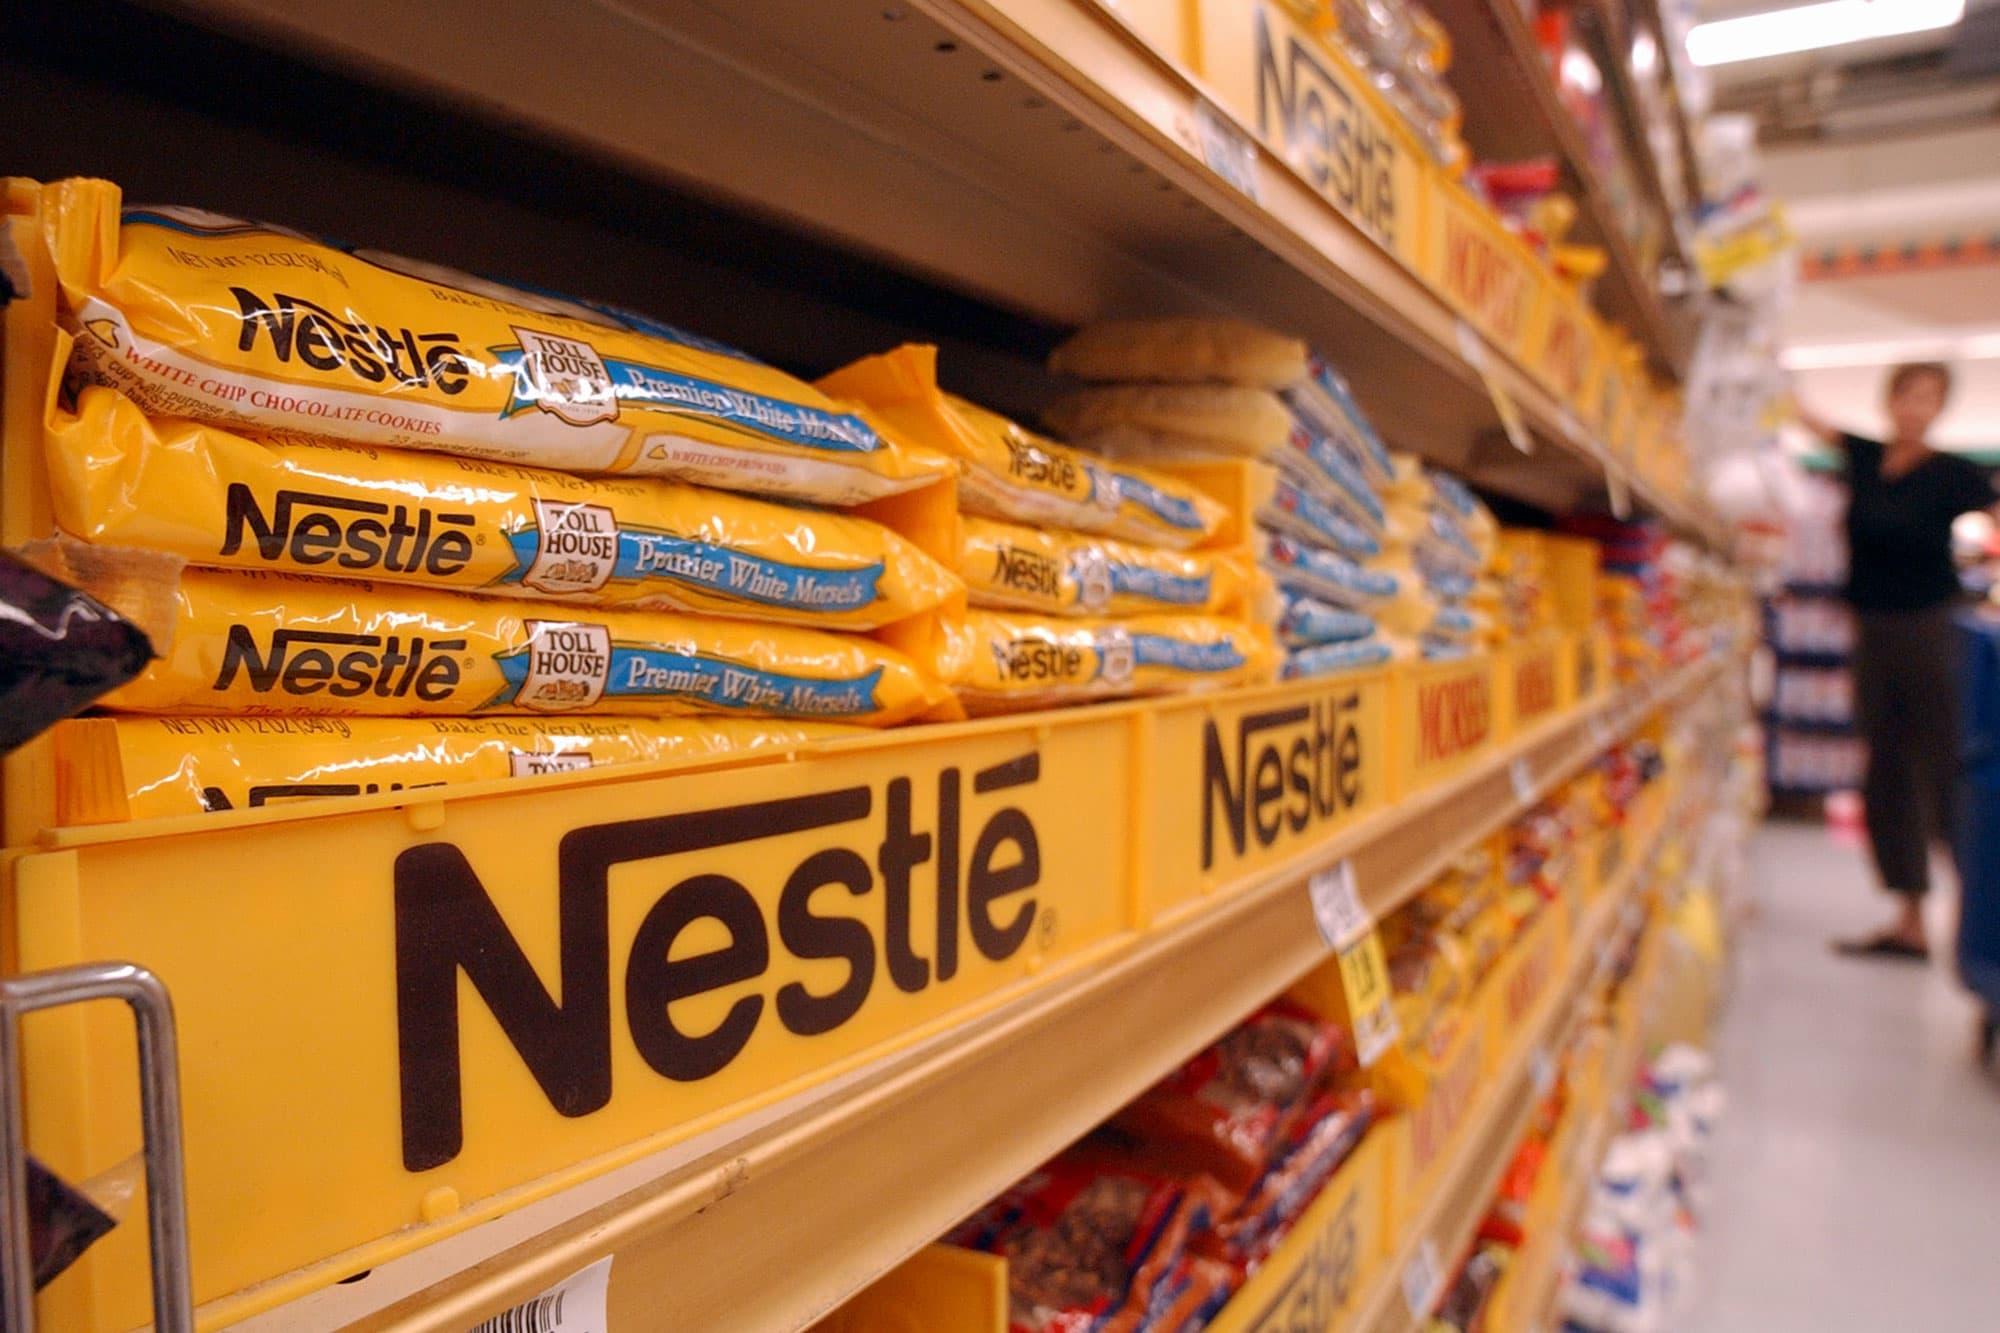 Nestle posts first-half organic growth of 3.6%